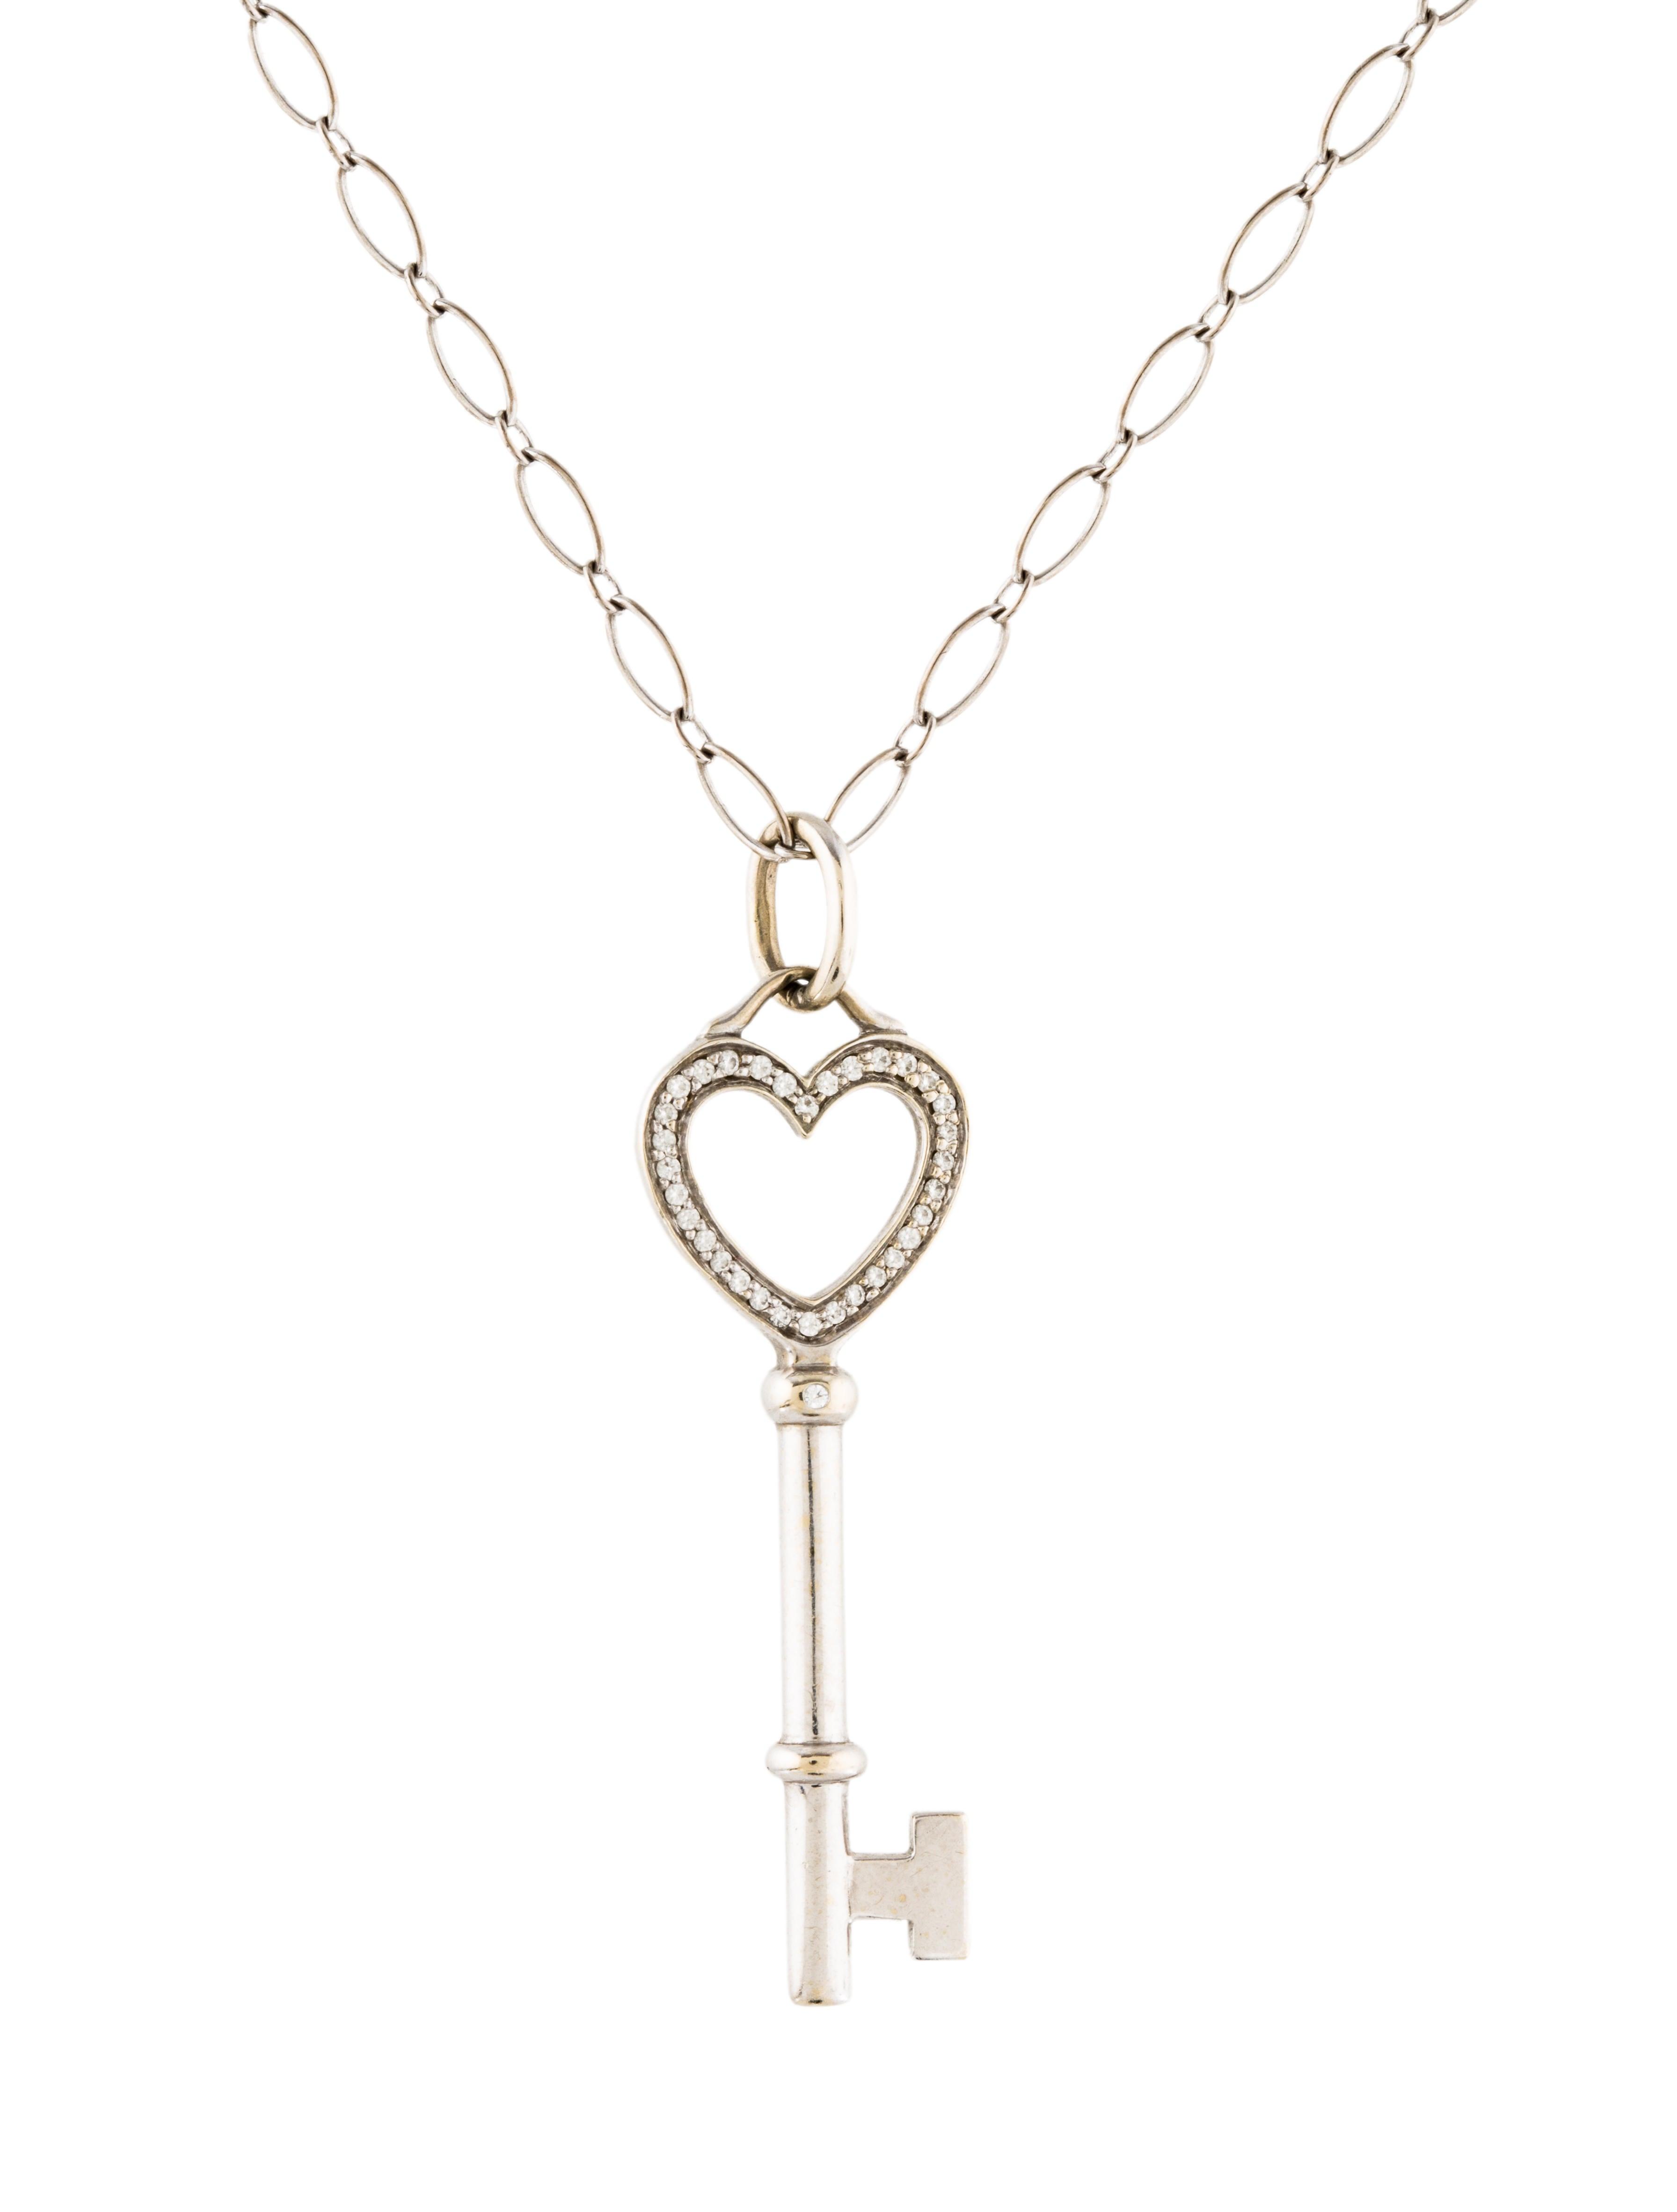 Tiffany co 18k diamond heart key pendant necklace necklaces 18k diamond heart key pendant necklace mozeypictures Images